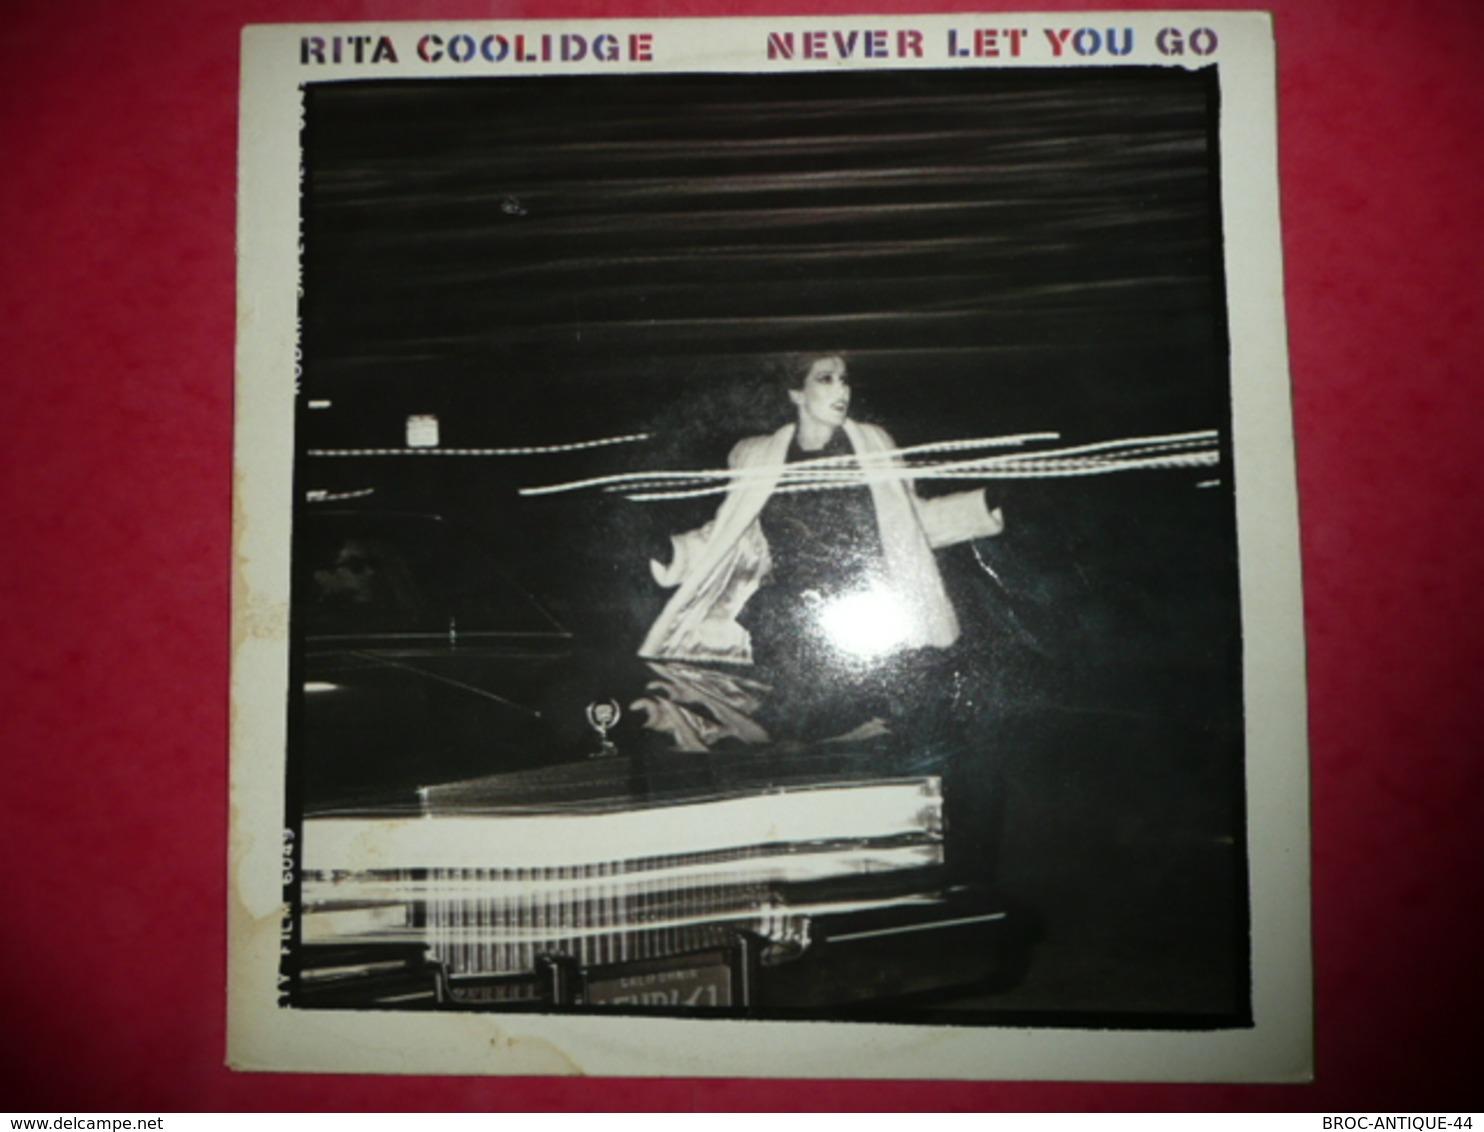 LP33 N°1474 - RITA COOLIDGE - NEVER LET YOU GO -  COMPILATION 10 TITRES POP FOLK ROCK COUNTRY - Country En Folk